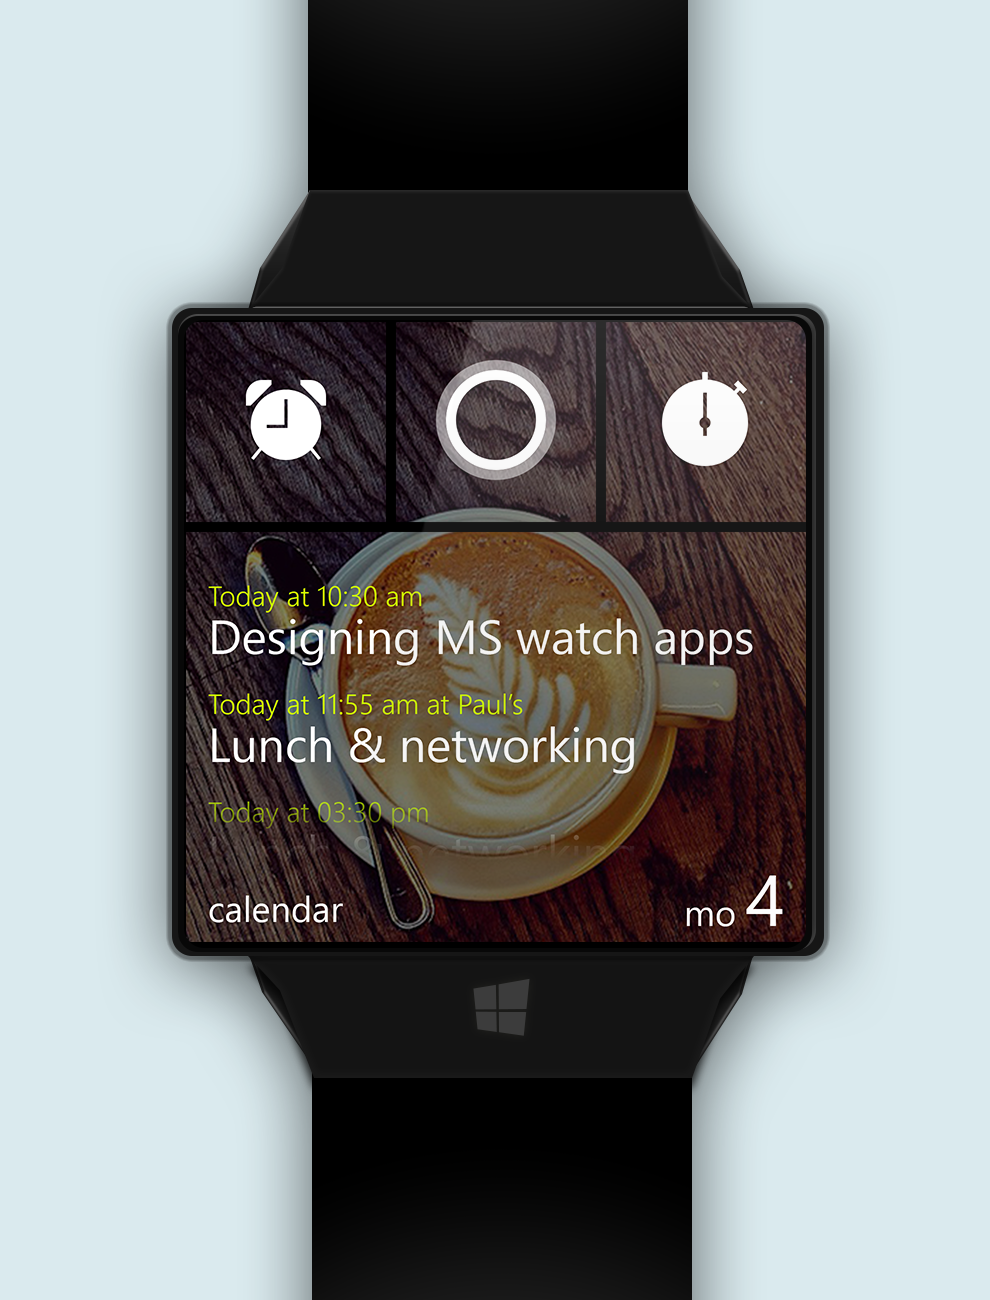 Windows_watch_calendar_cortana_stopwatch_alarm